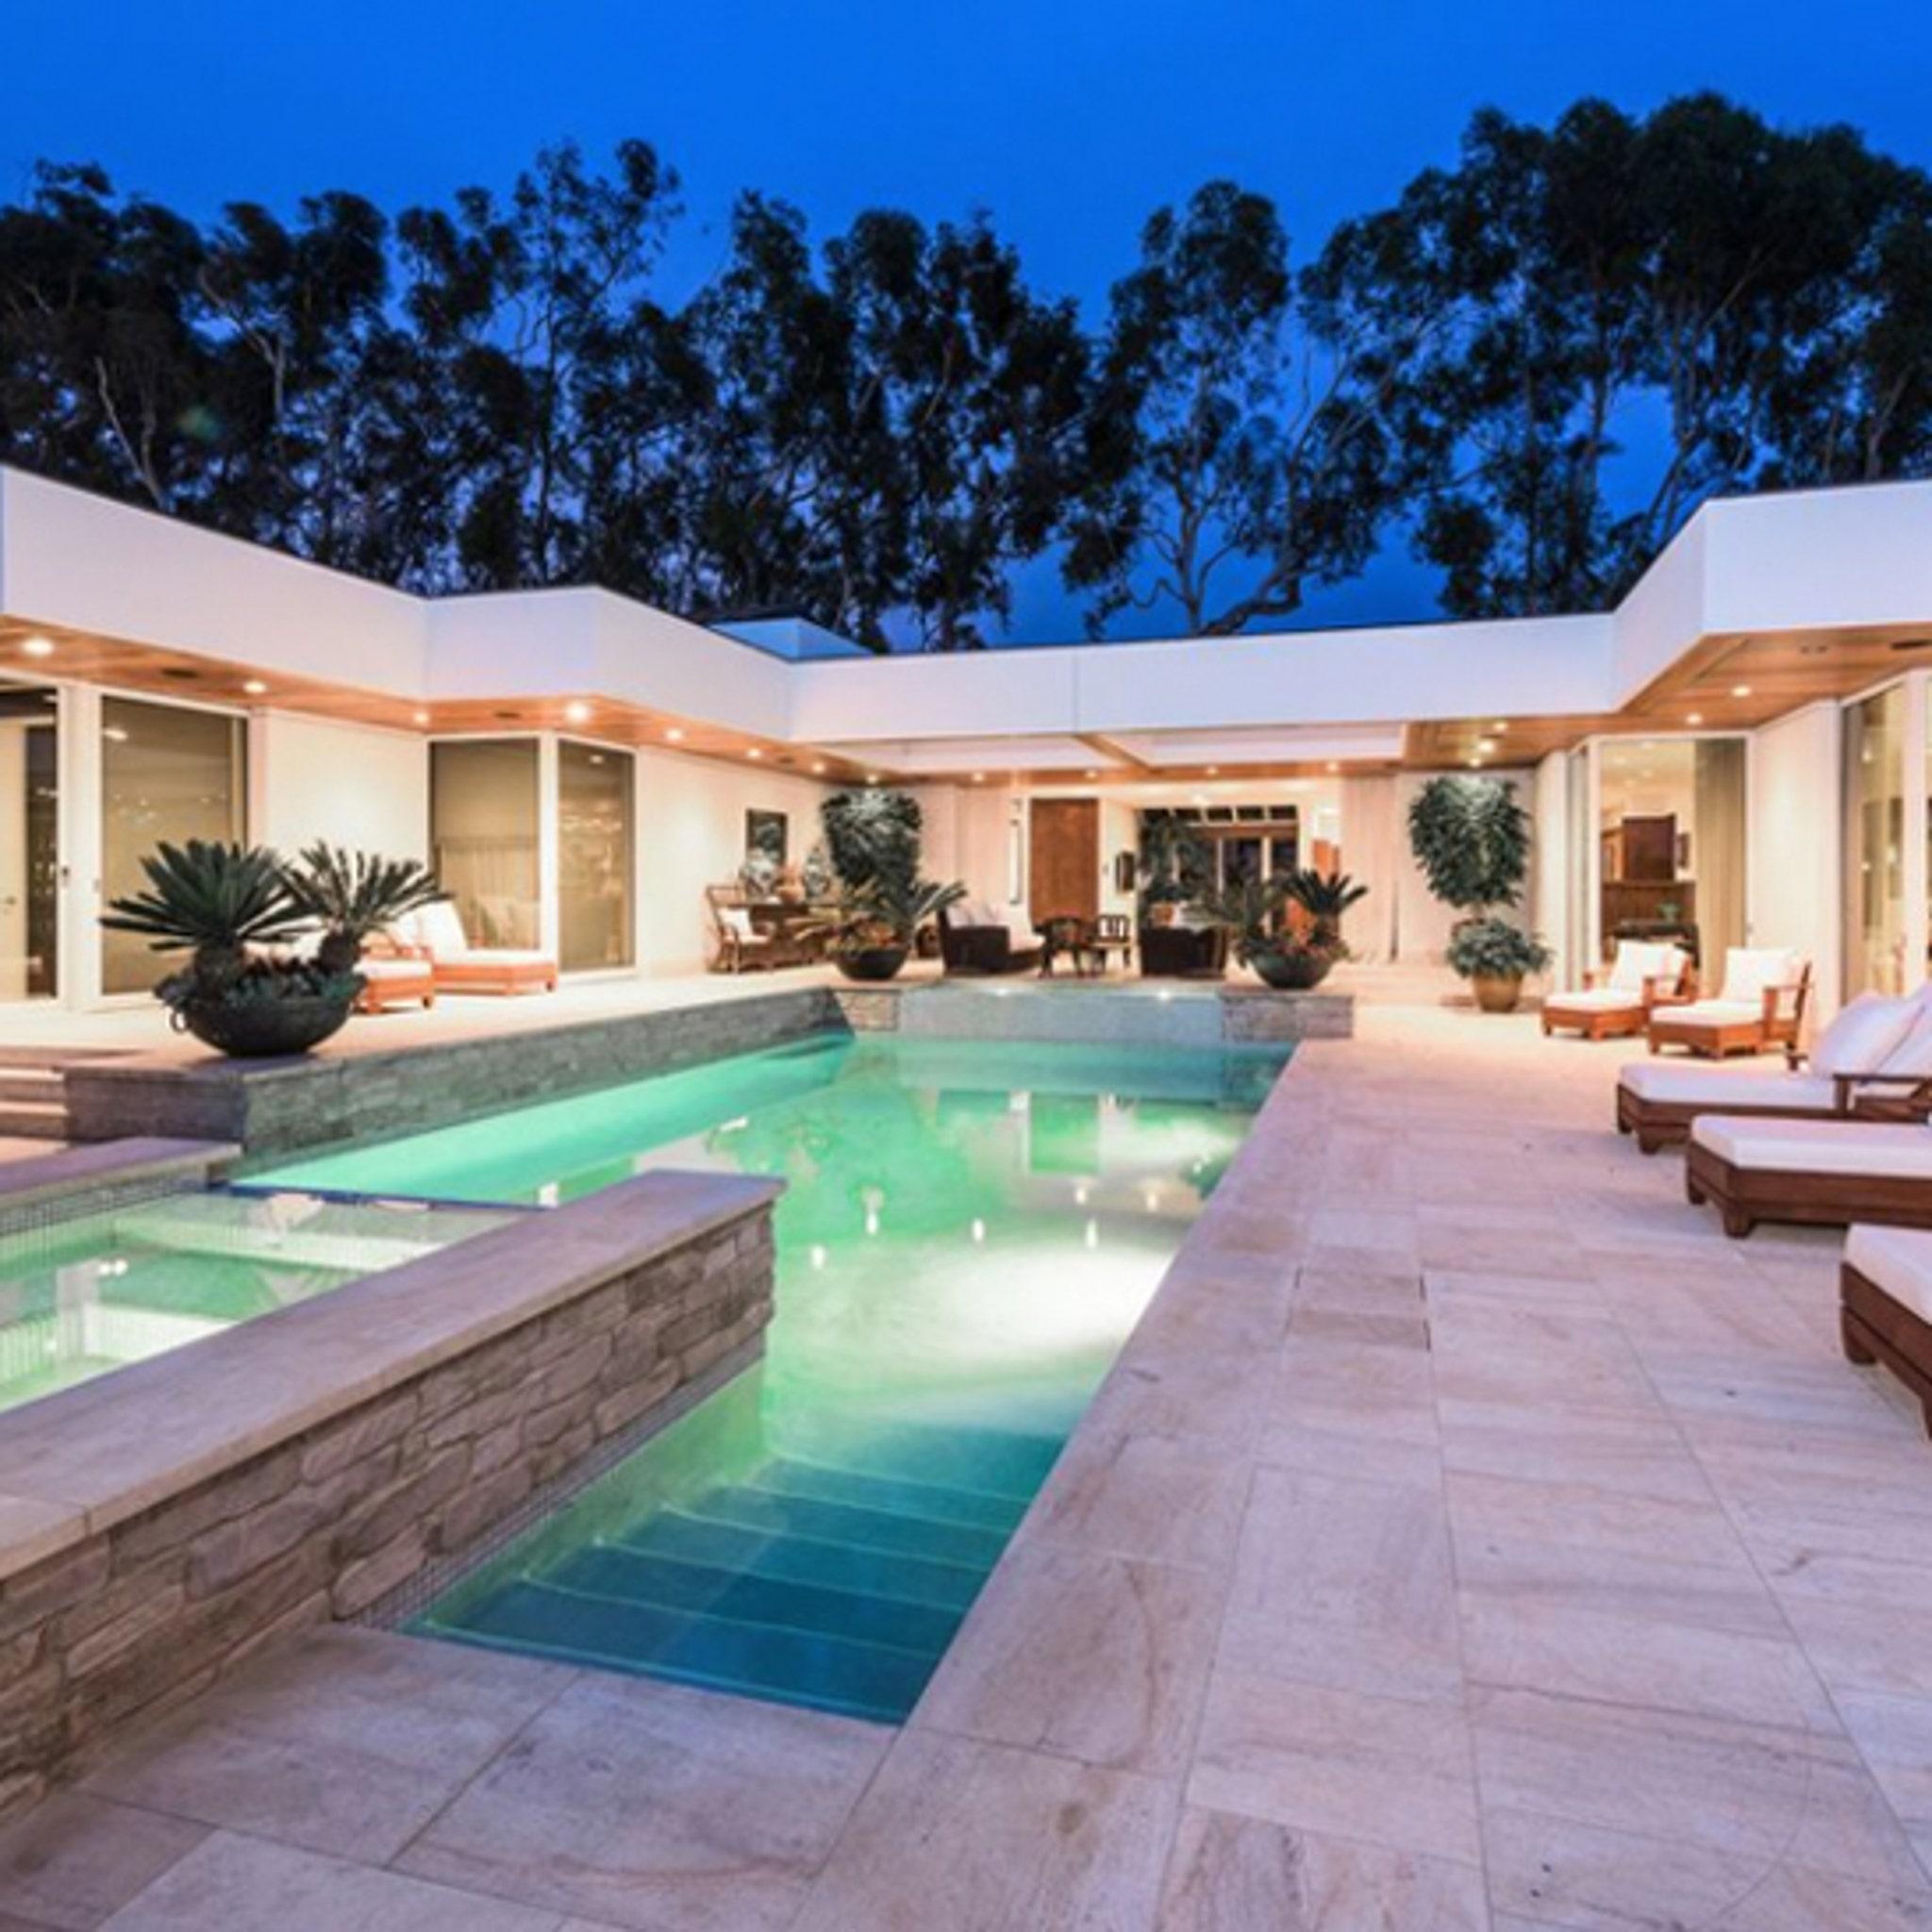 Simon Cowell Drops $25 Mil on Malibu Estate